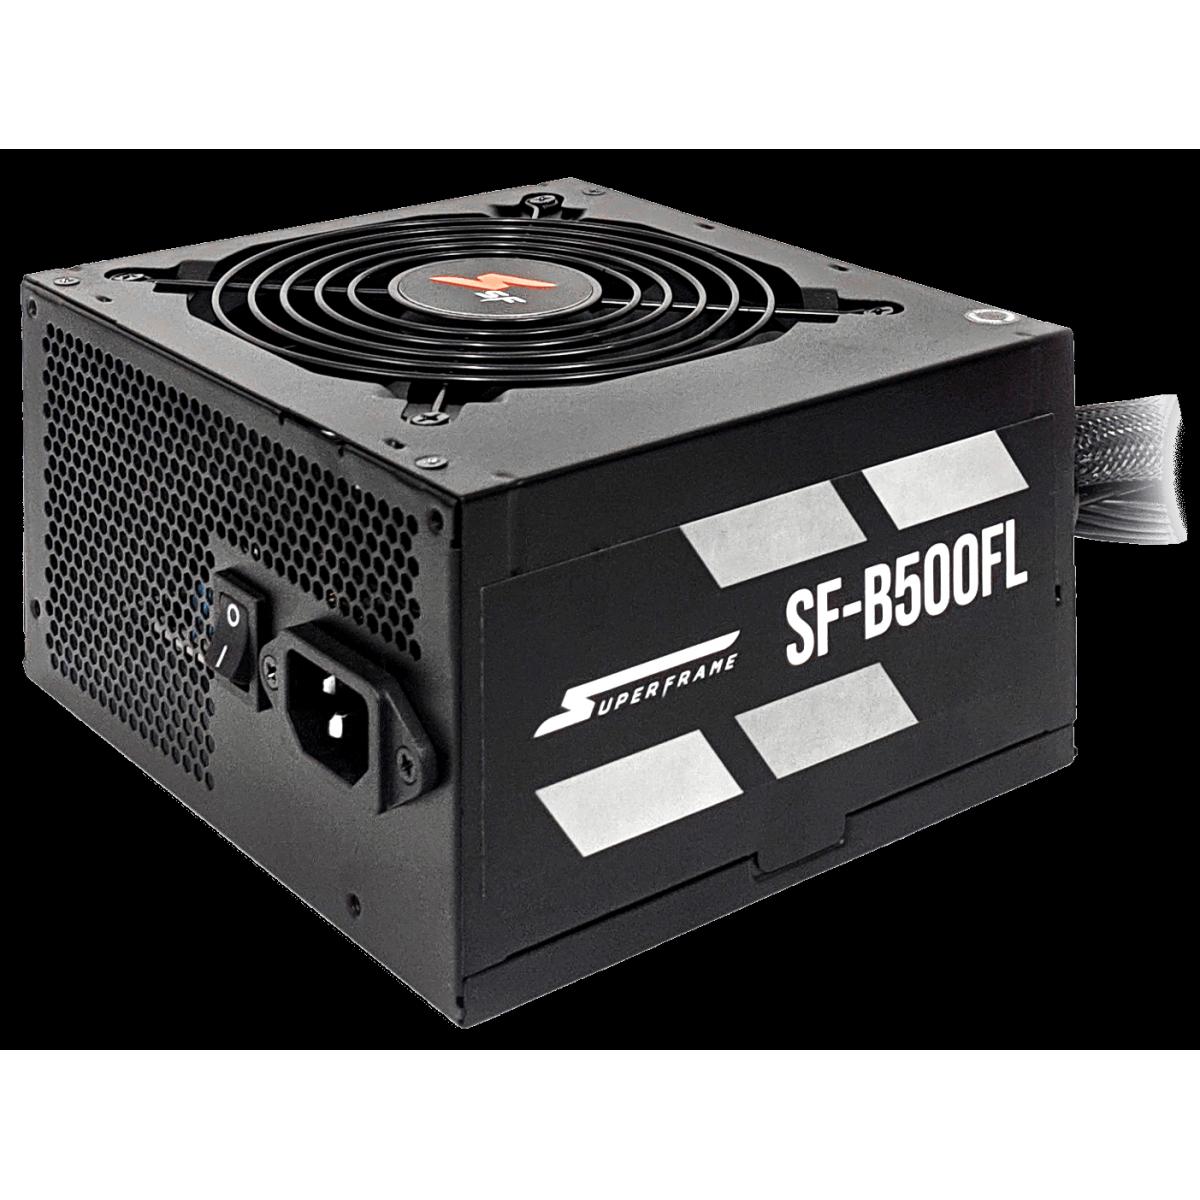 Fonte SuperFrame, 500W, 80 Plus Bronze, PFC Ativo, Cabos Flat, SF-B500FL